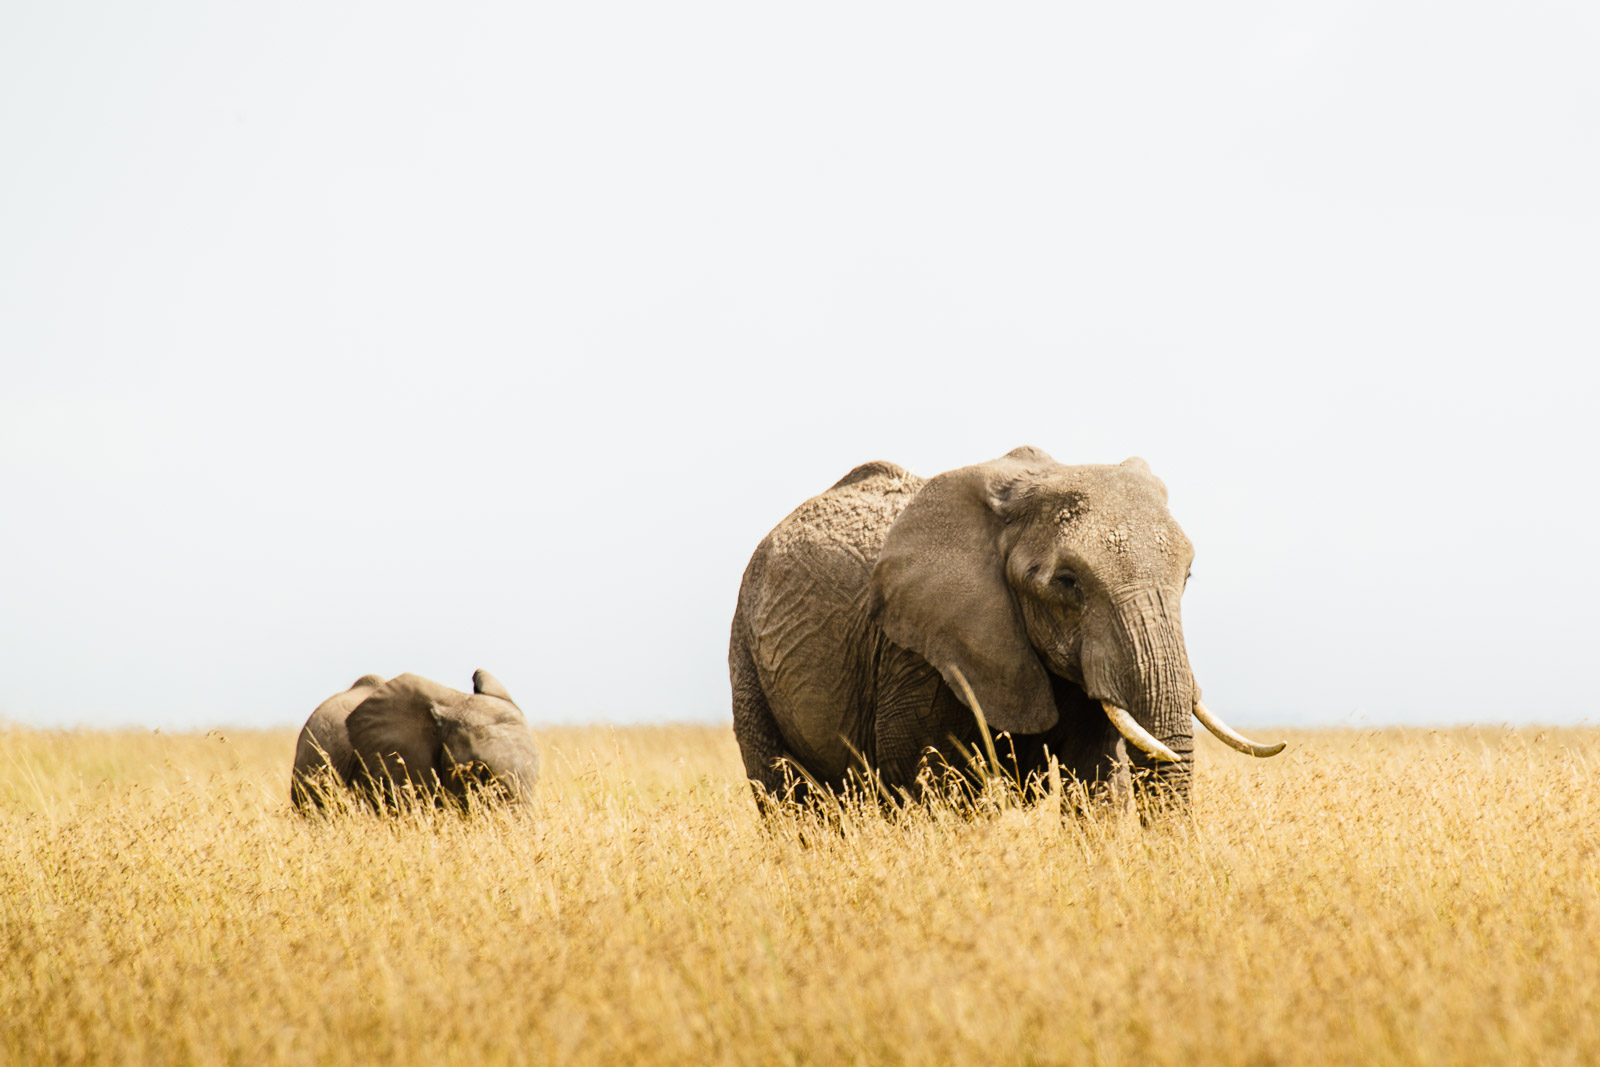 tanzania-africa-travel-photos-adventure-safari-3.jpg